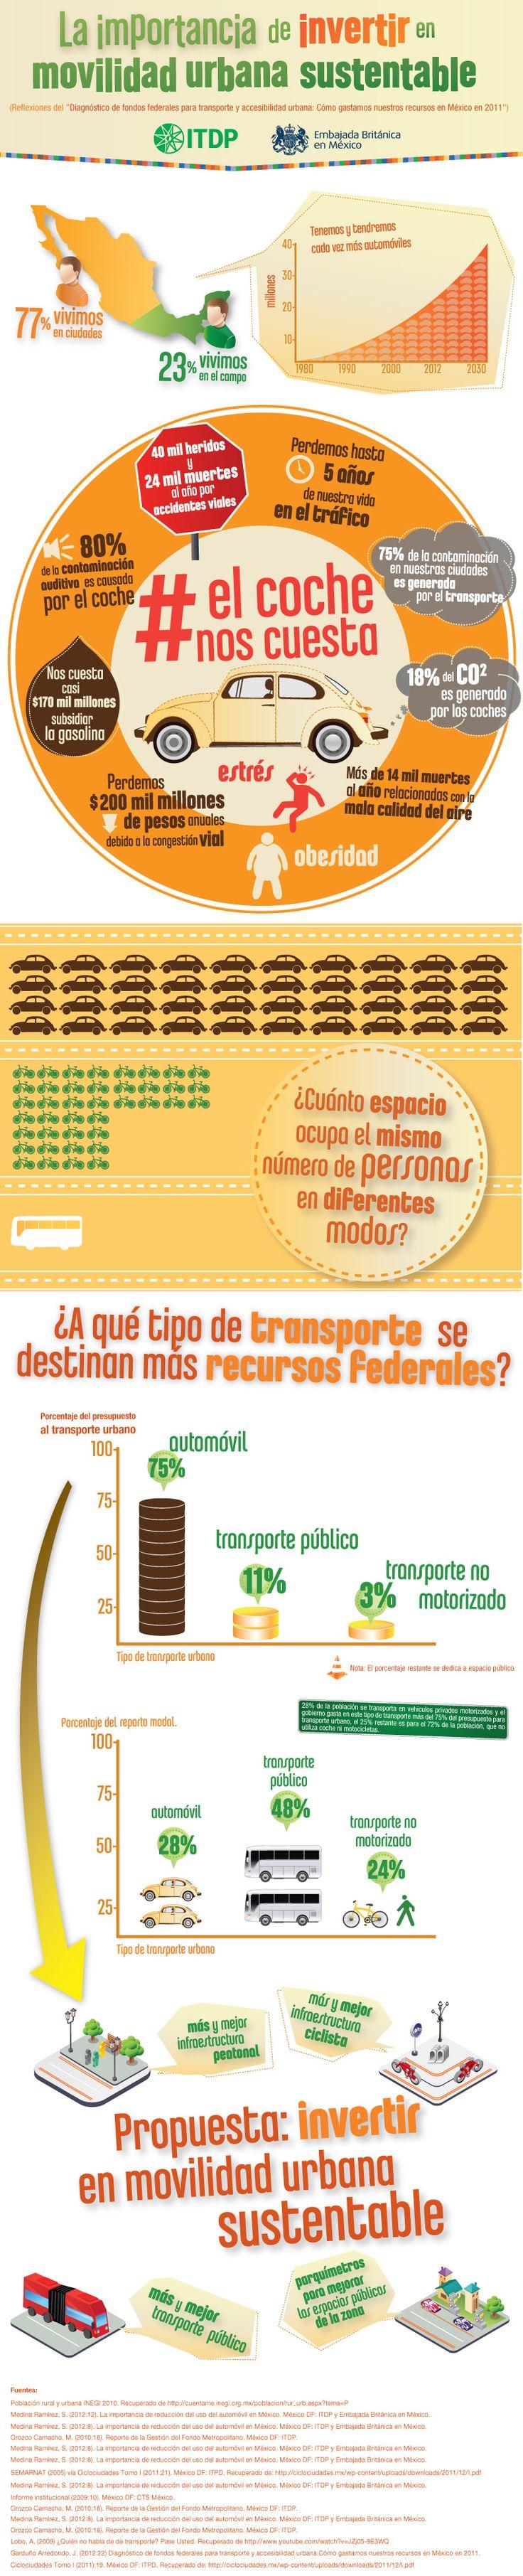 Movilidad urbana sostenible en México #infografia #infographic